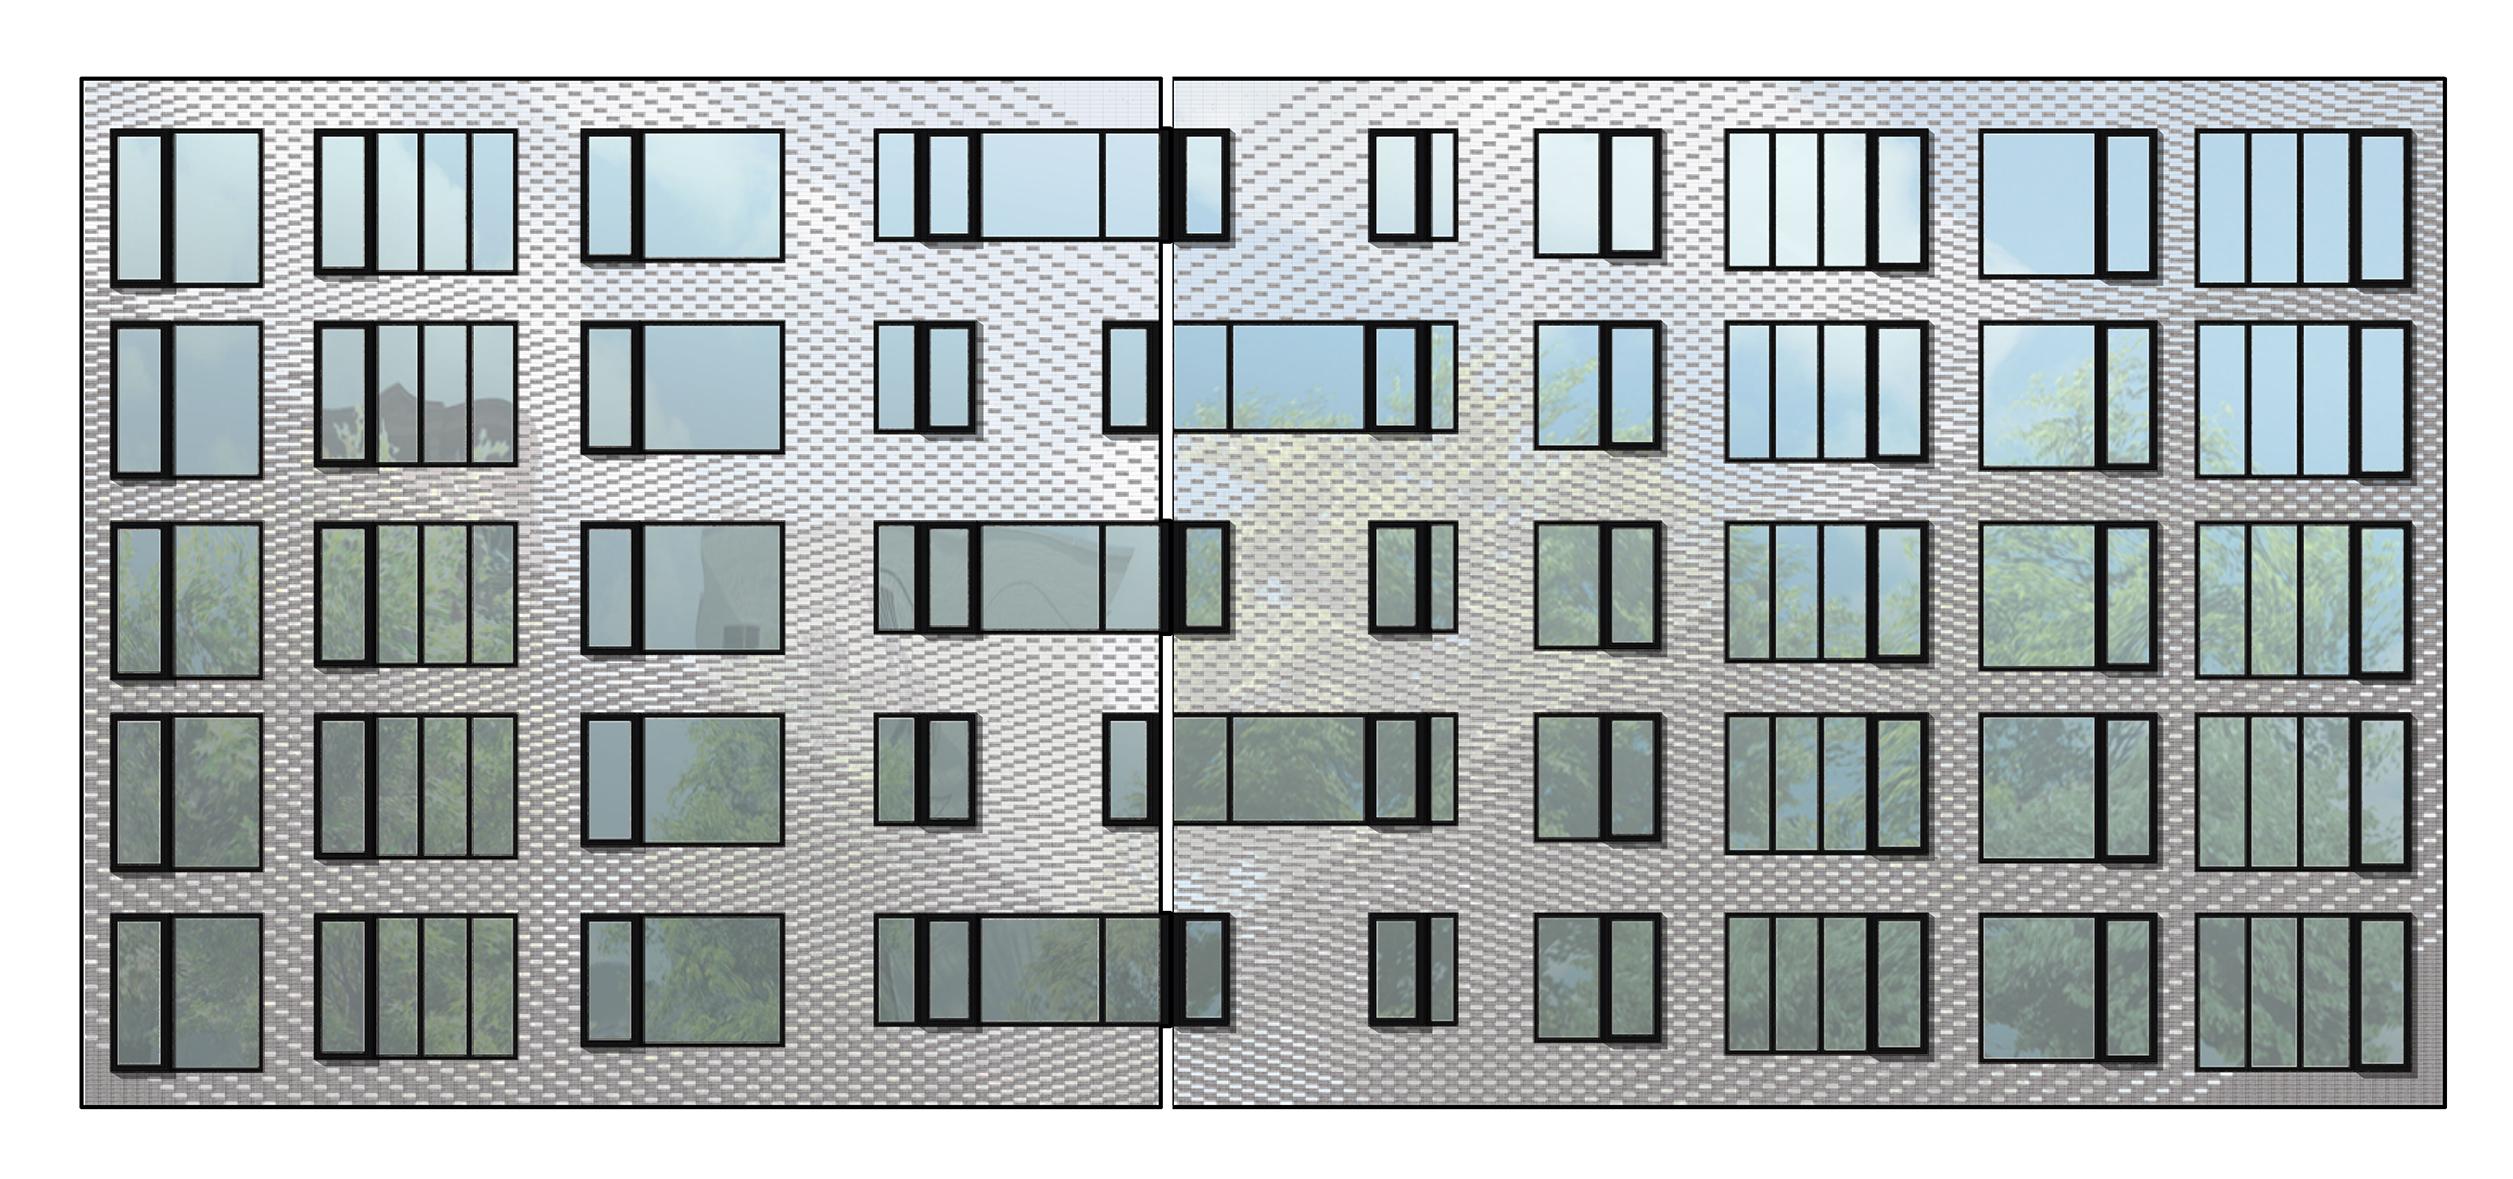 jccos first project landmarked soho mixed use condo commercial development